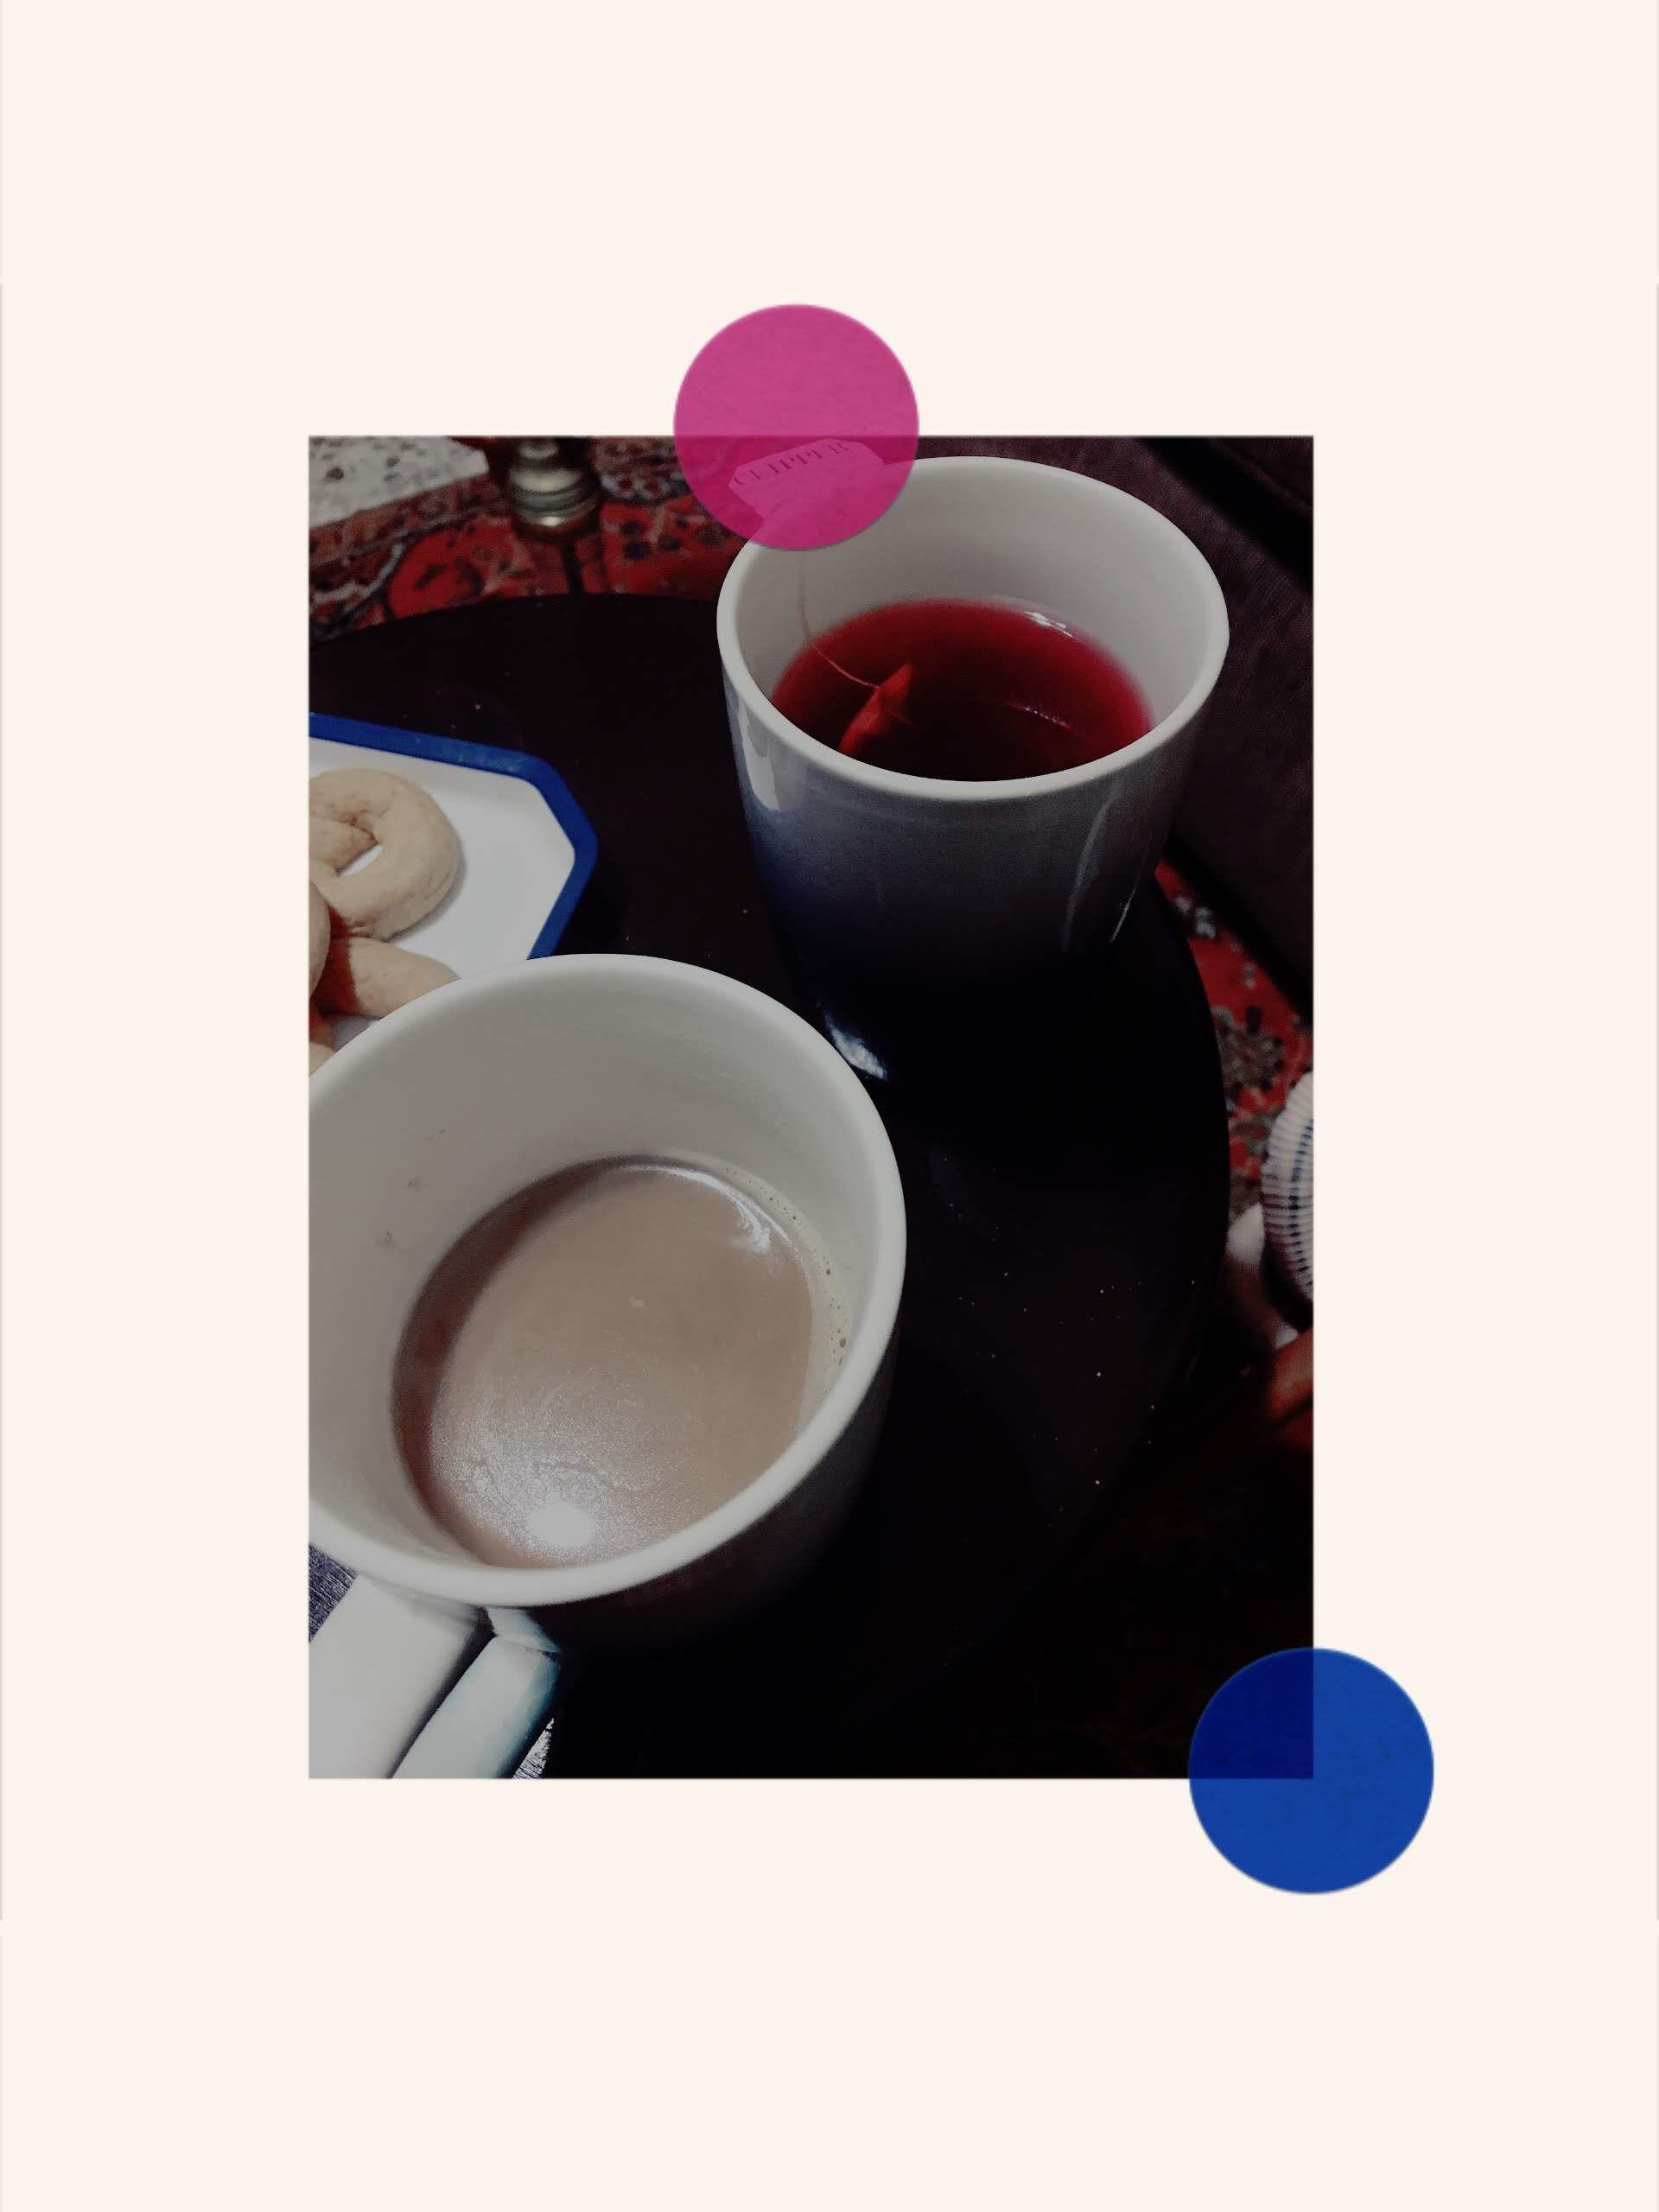 Pin By Marya Sweidan On Foodgram Tableware Glassware Kitchen